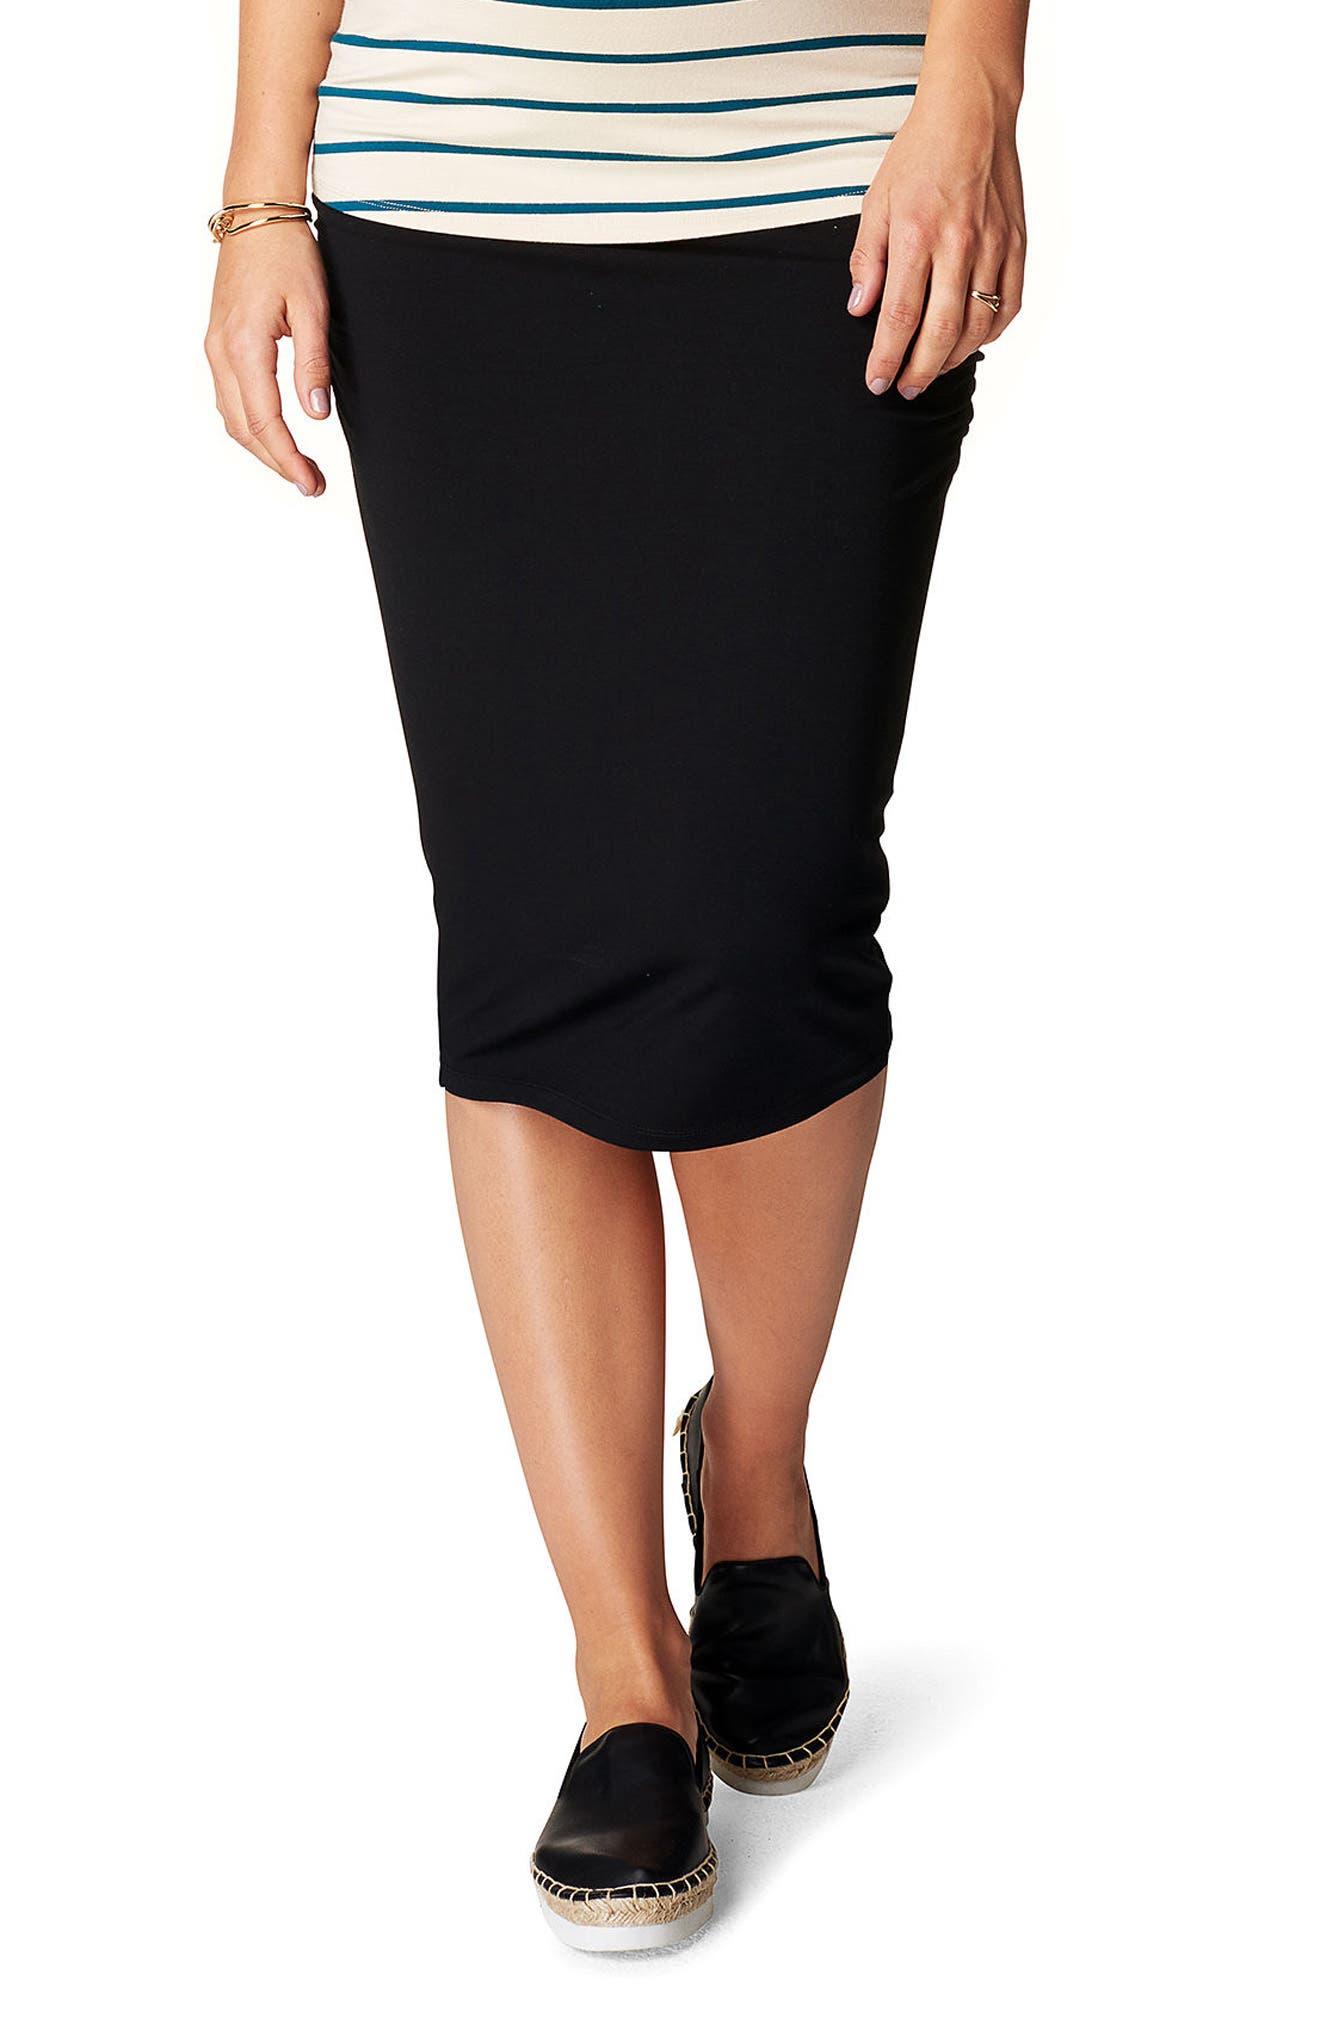 Vida Maternity Skirt,                             Main thumbnail 1, color,                             BLACK